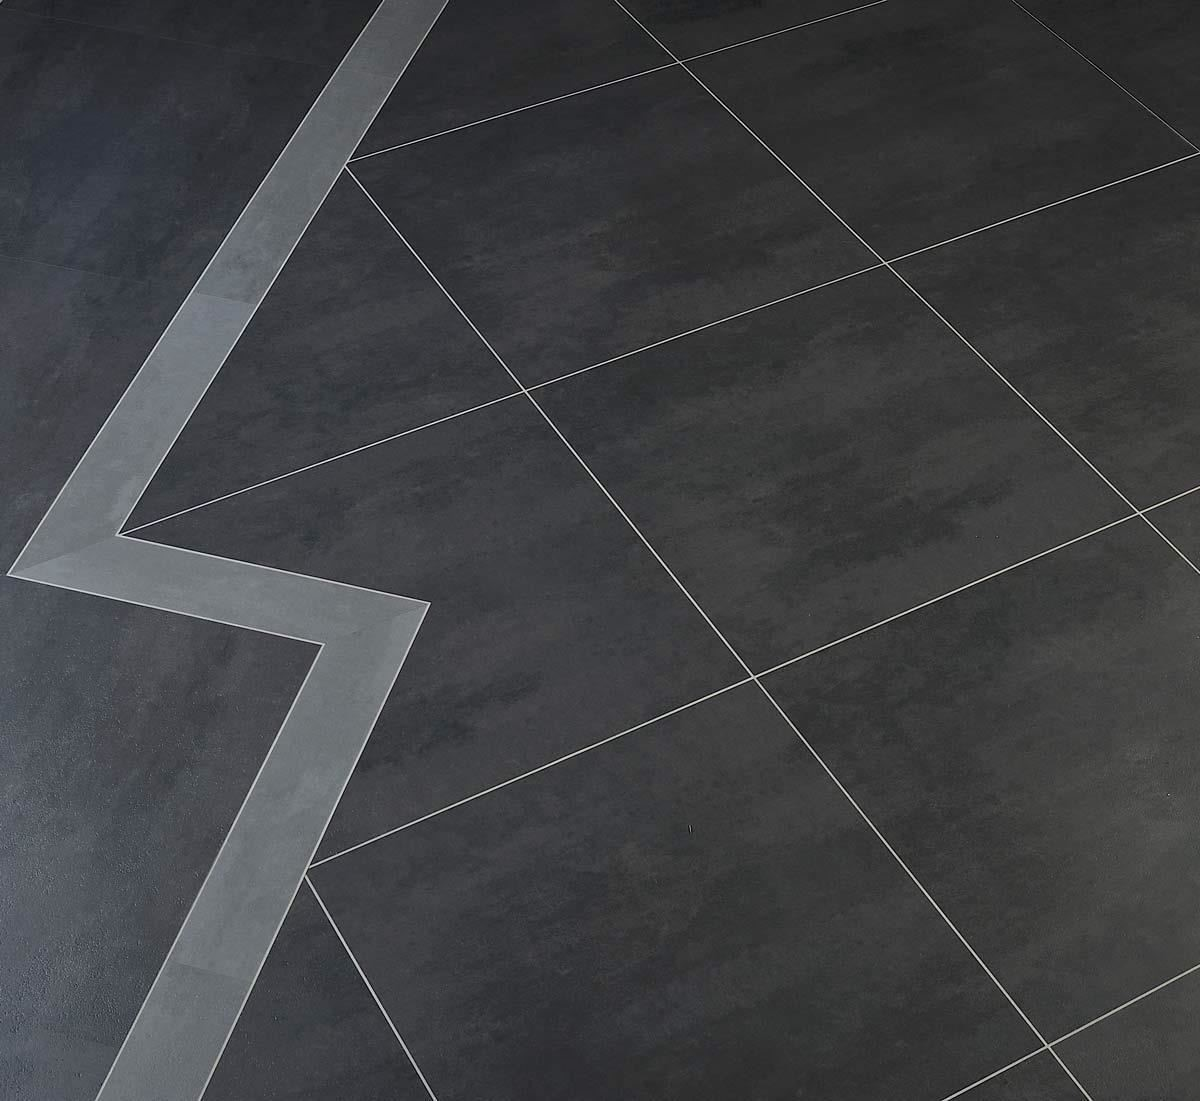 New square 系列,有著宛如石材的原始質感,連觸感都幾乎相同,還能加上嵌條,讓地坪變化出多元造型。